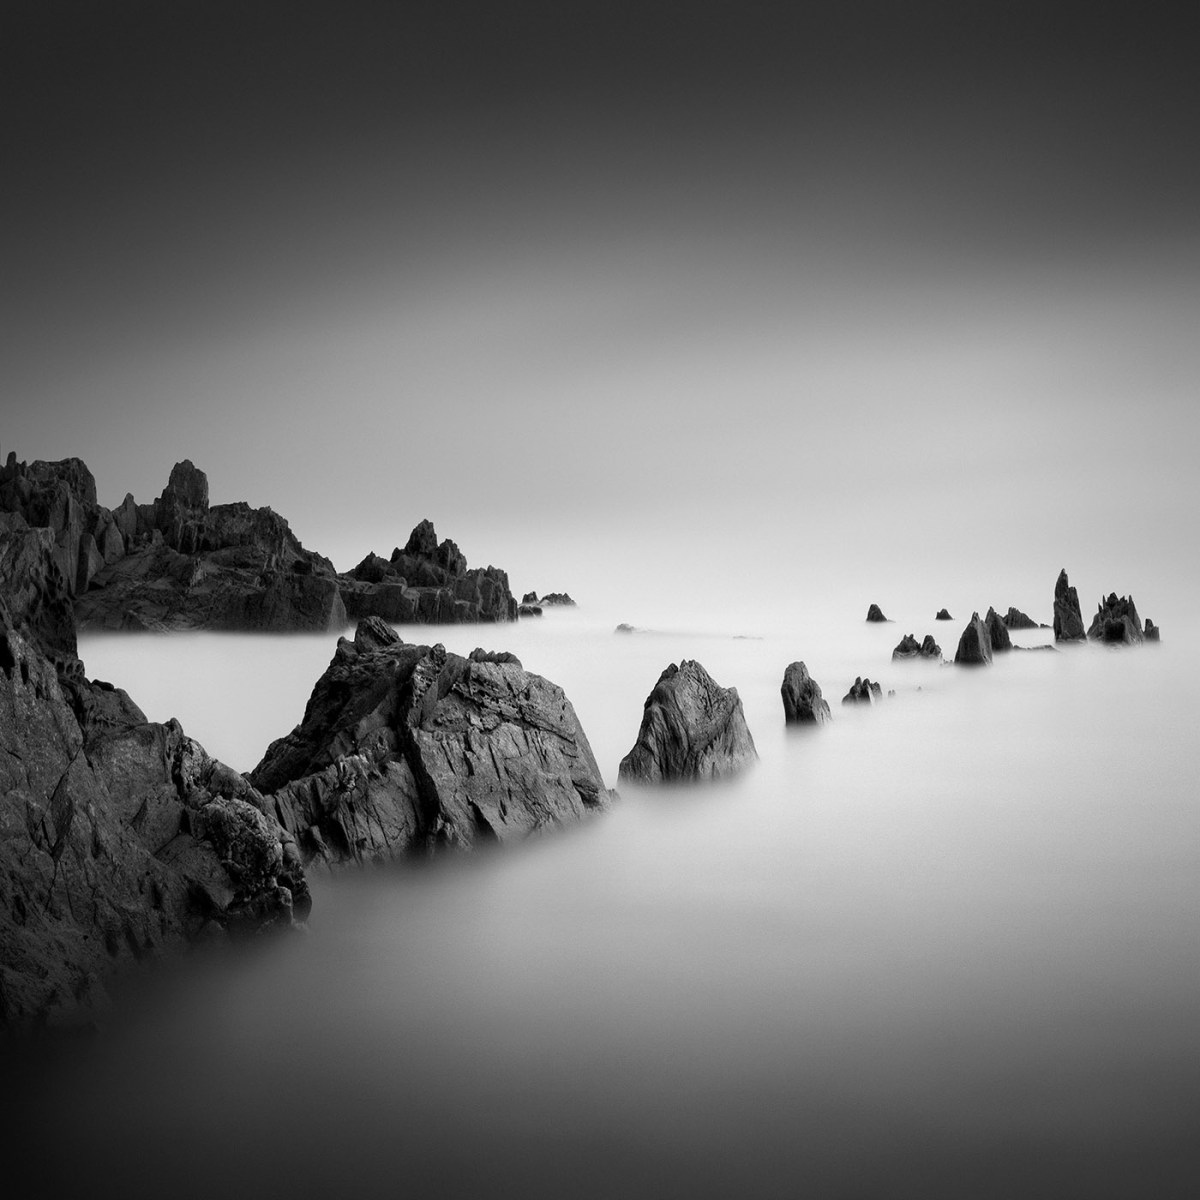 Arnaud-Bathiard-eternity-moss-and-fog-2